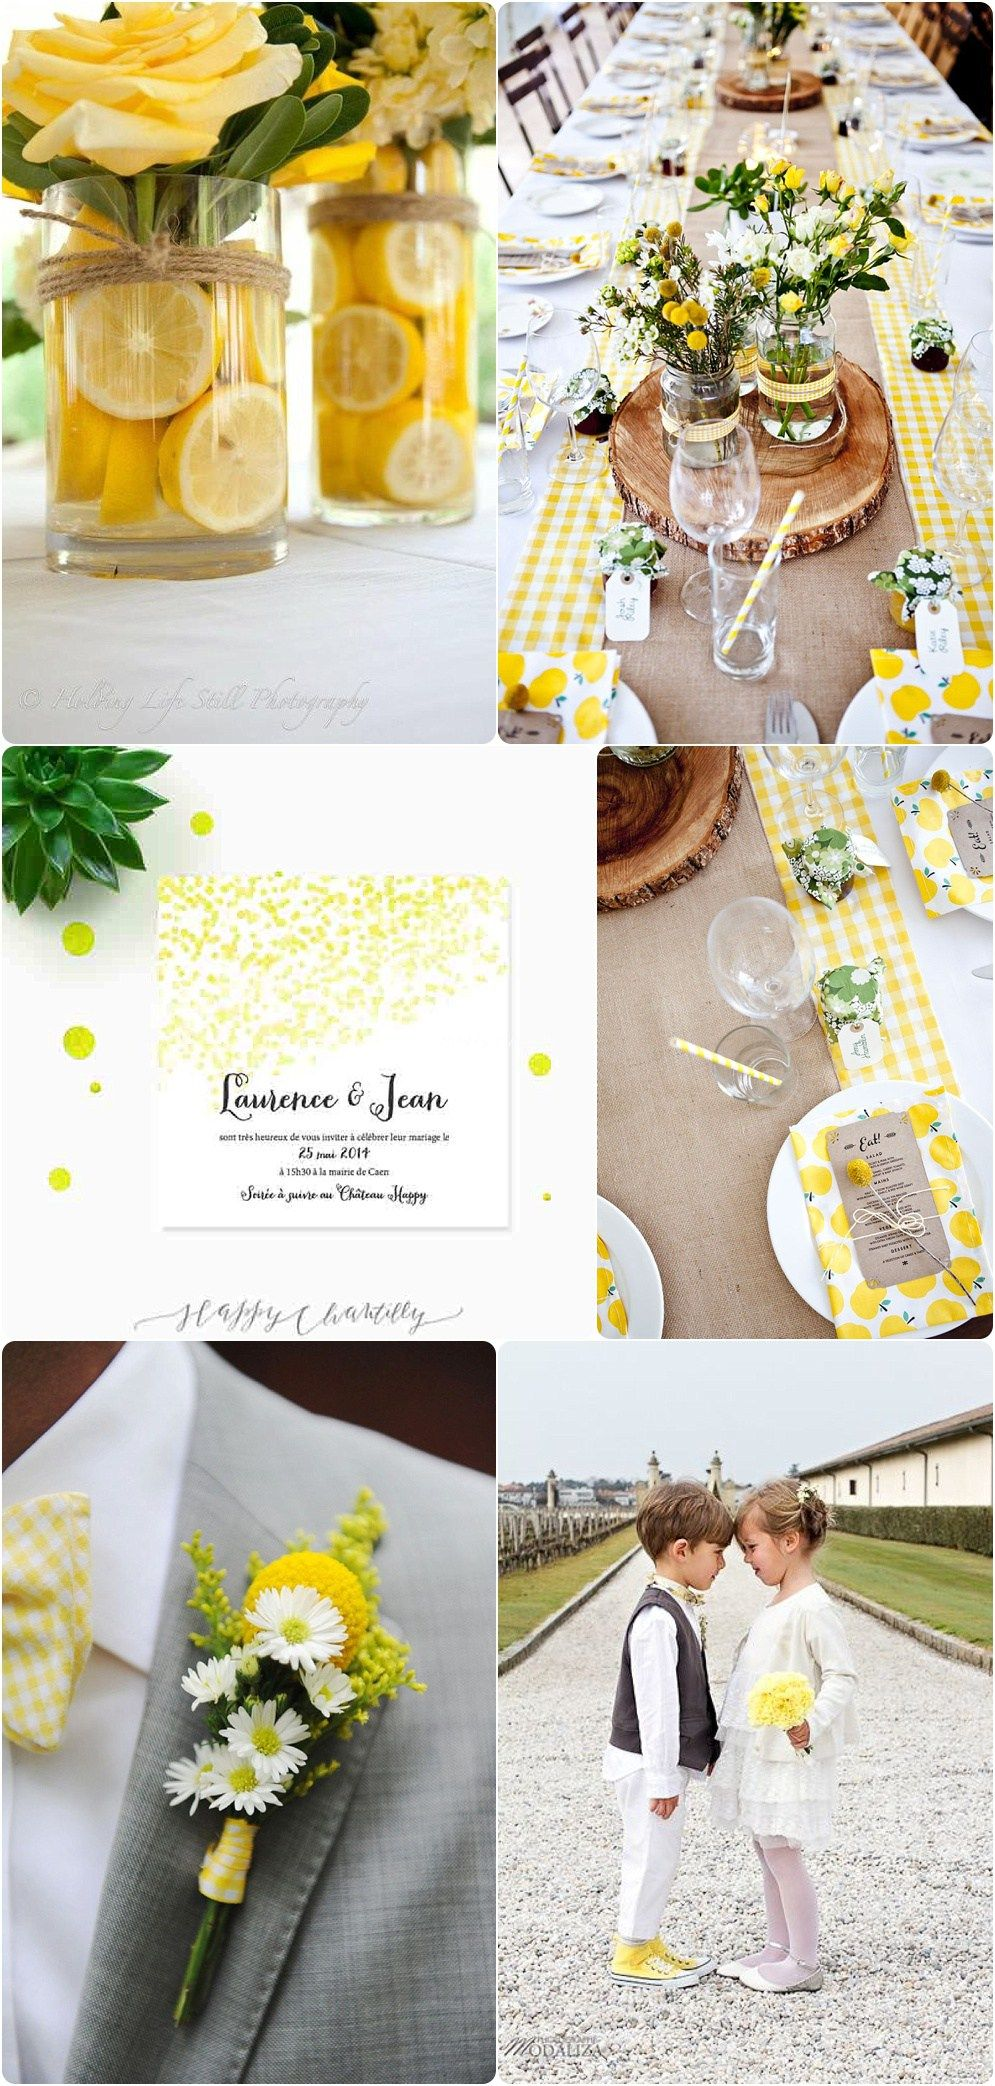 moodboard mariage jaune mariage mariage jaune d coration mariage et d co mariage jaune. Black Bedroom Furniture Sets. Home Design Ideas